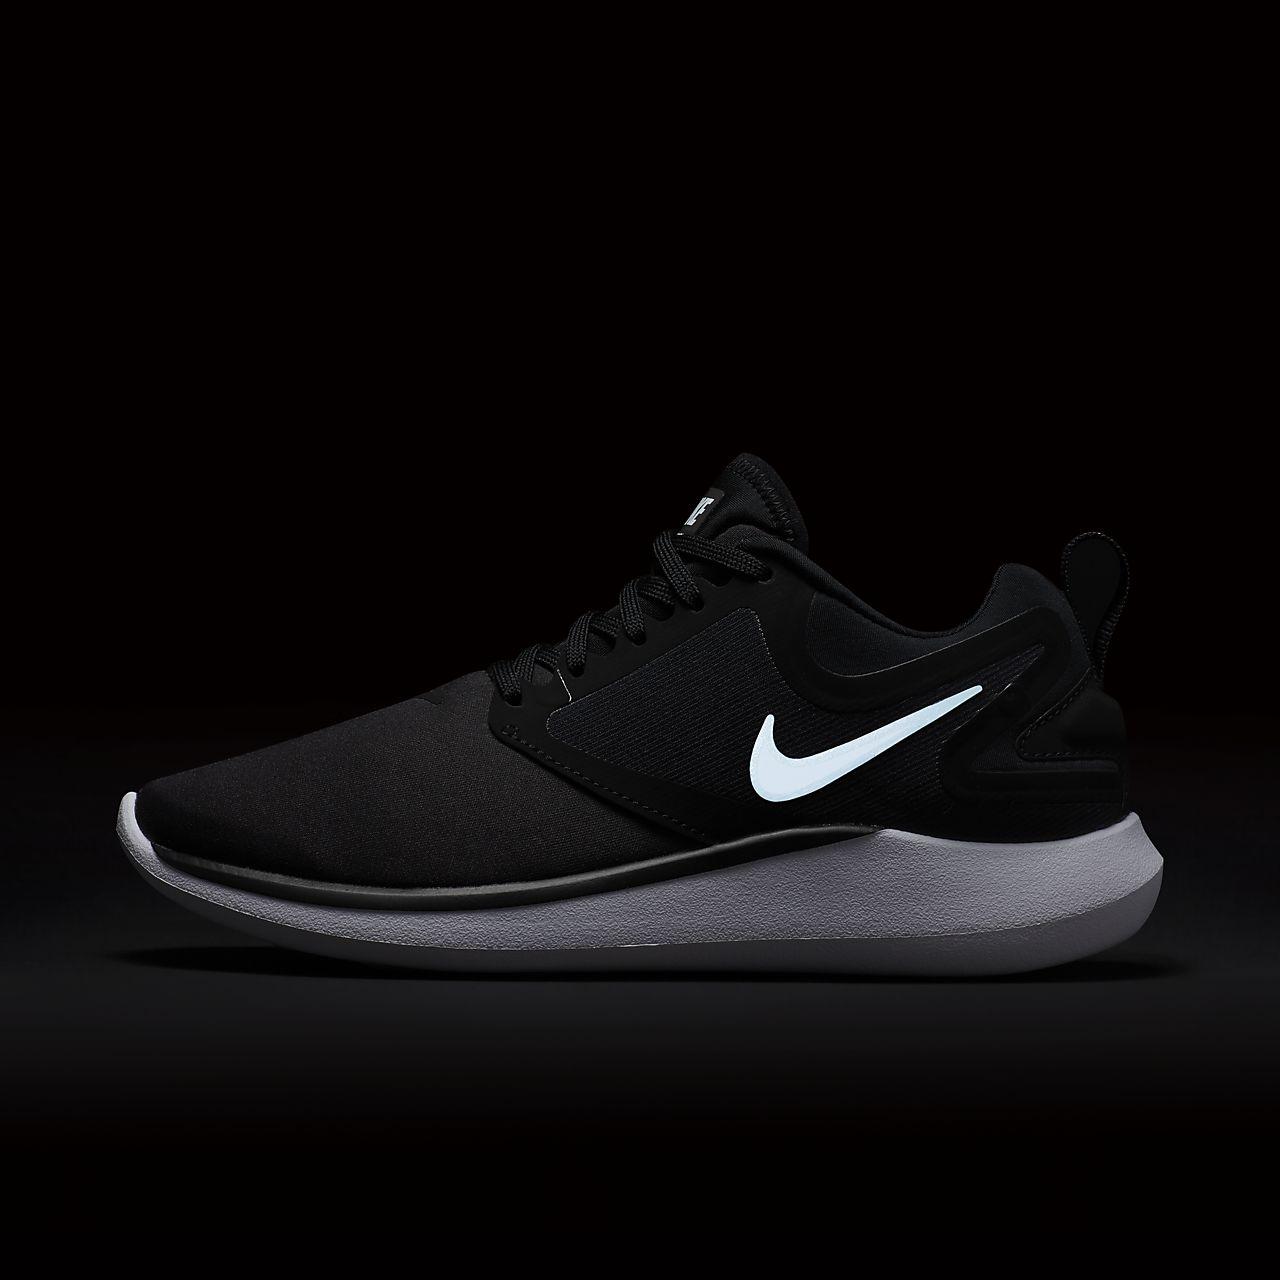 Nike Basketball Nikecom FR